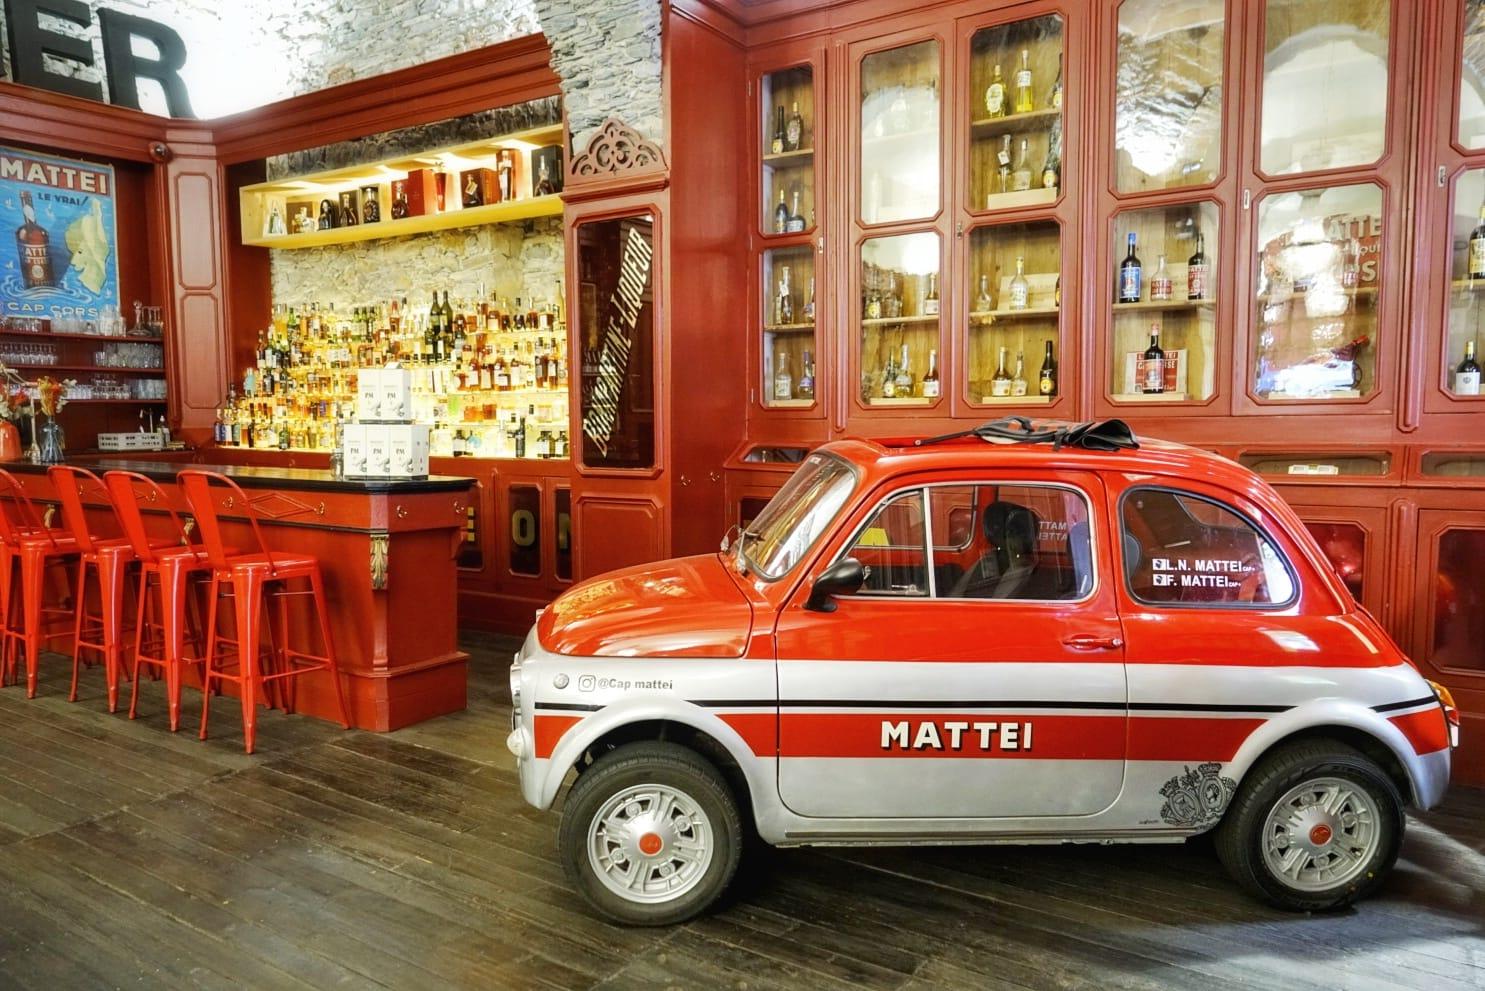 Tienda Mattei en Bastia